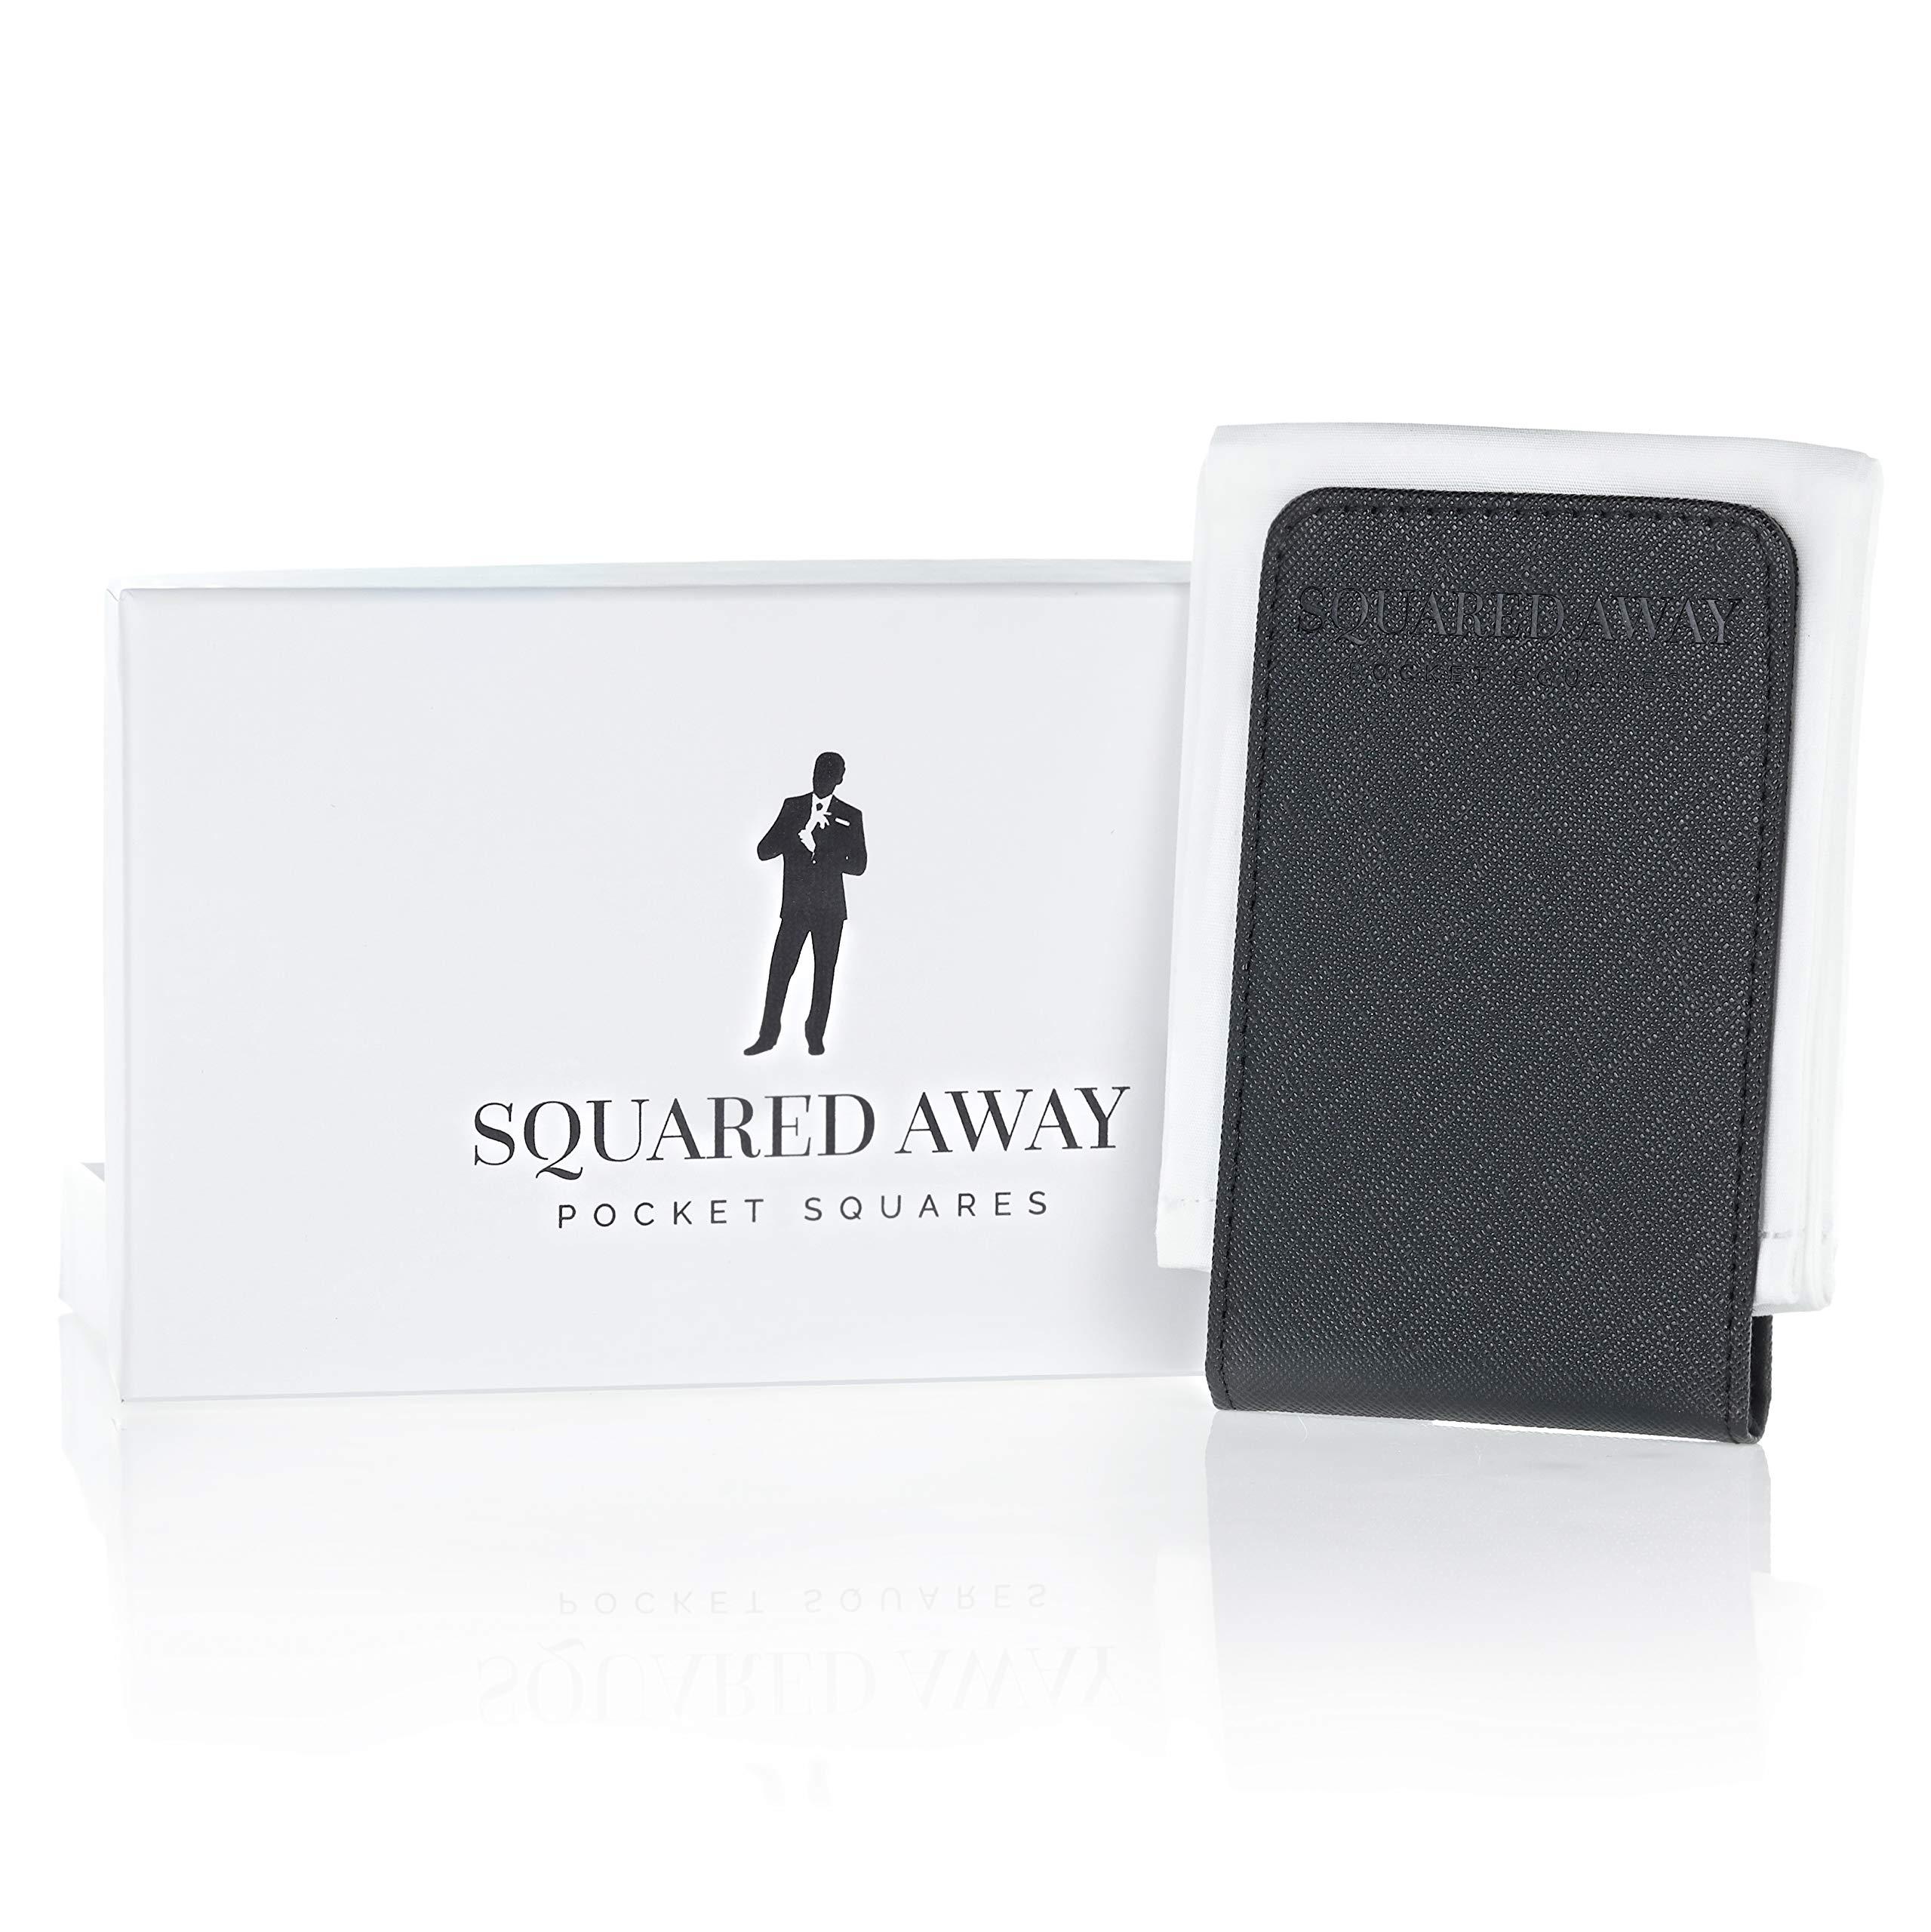 Squared Away: Pocket Square Movement - Pocket Square & Pocket Square Holder - Innovative Sleeve Design (White)